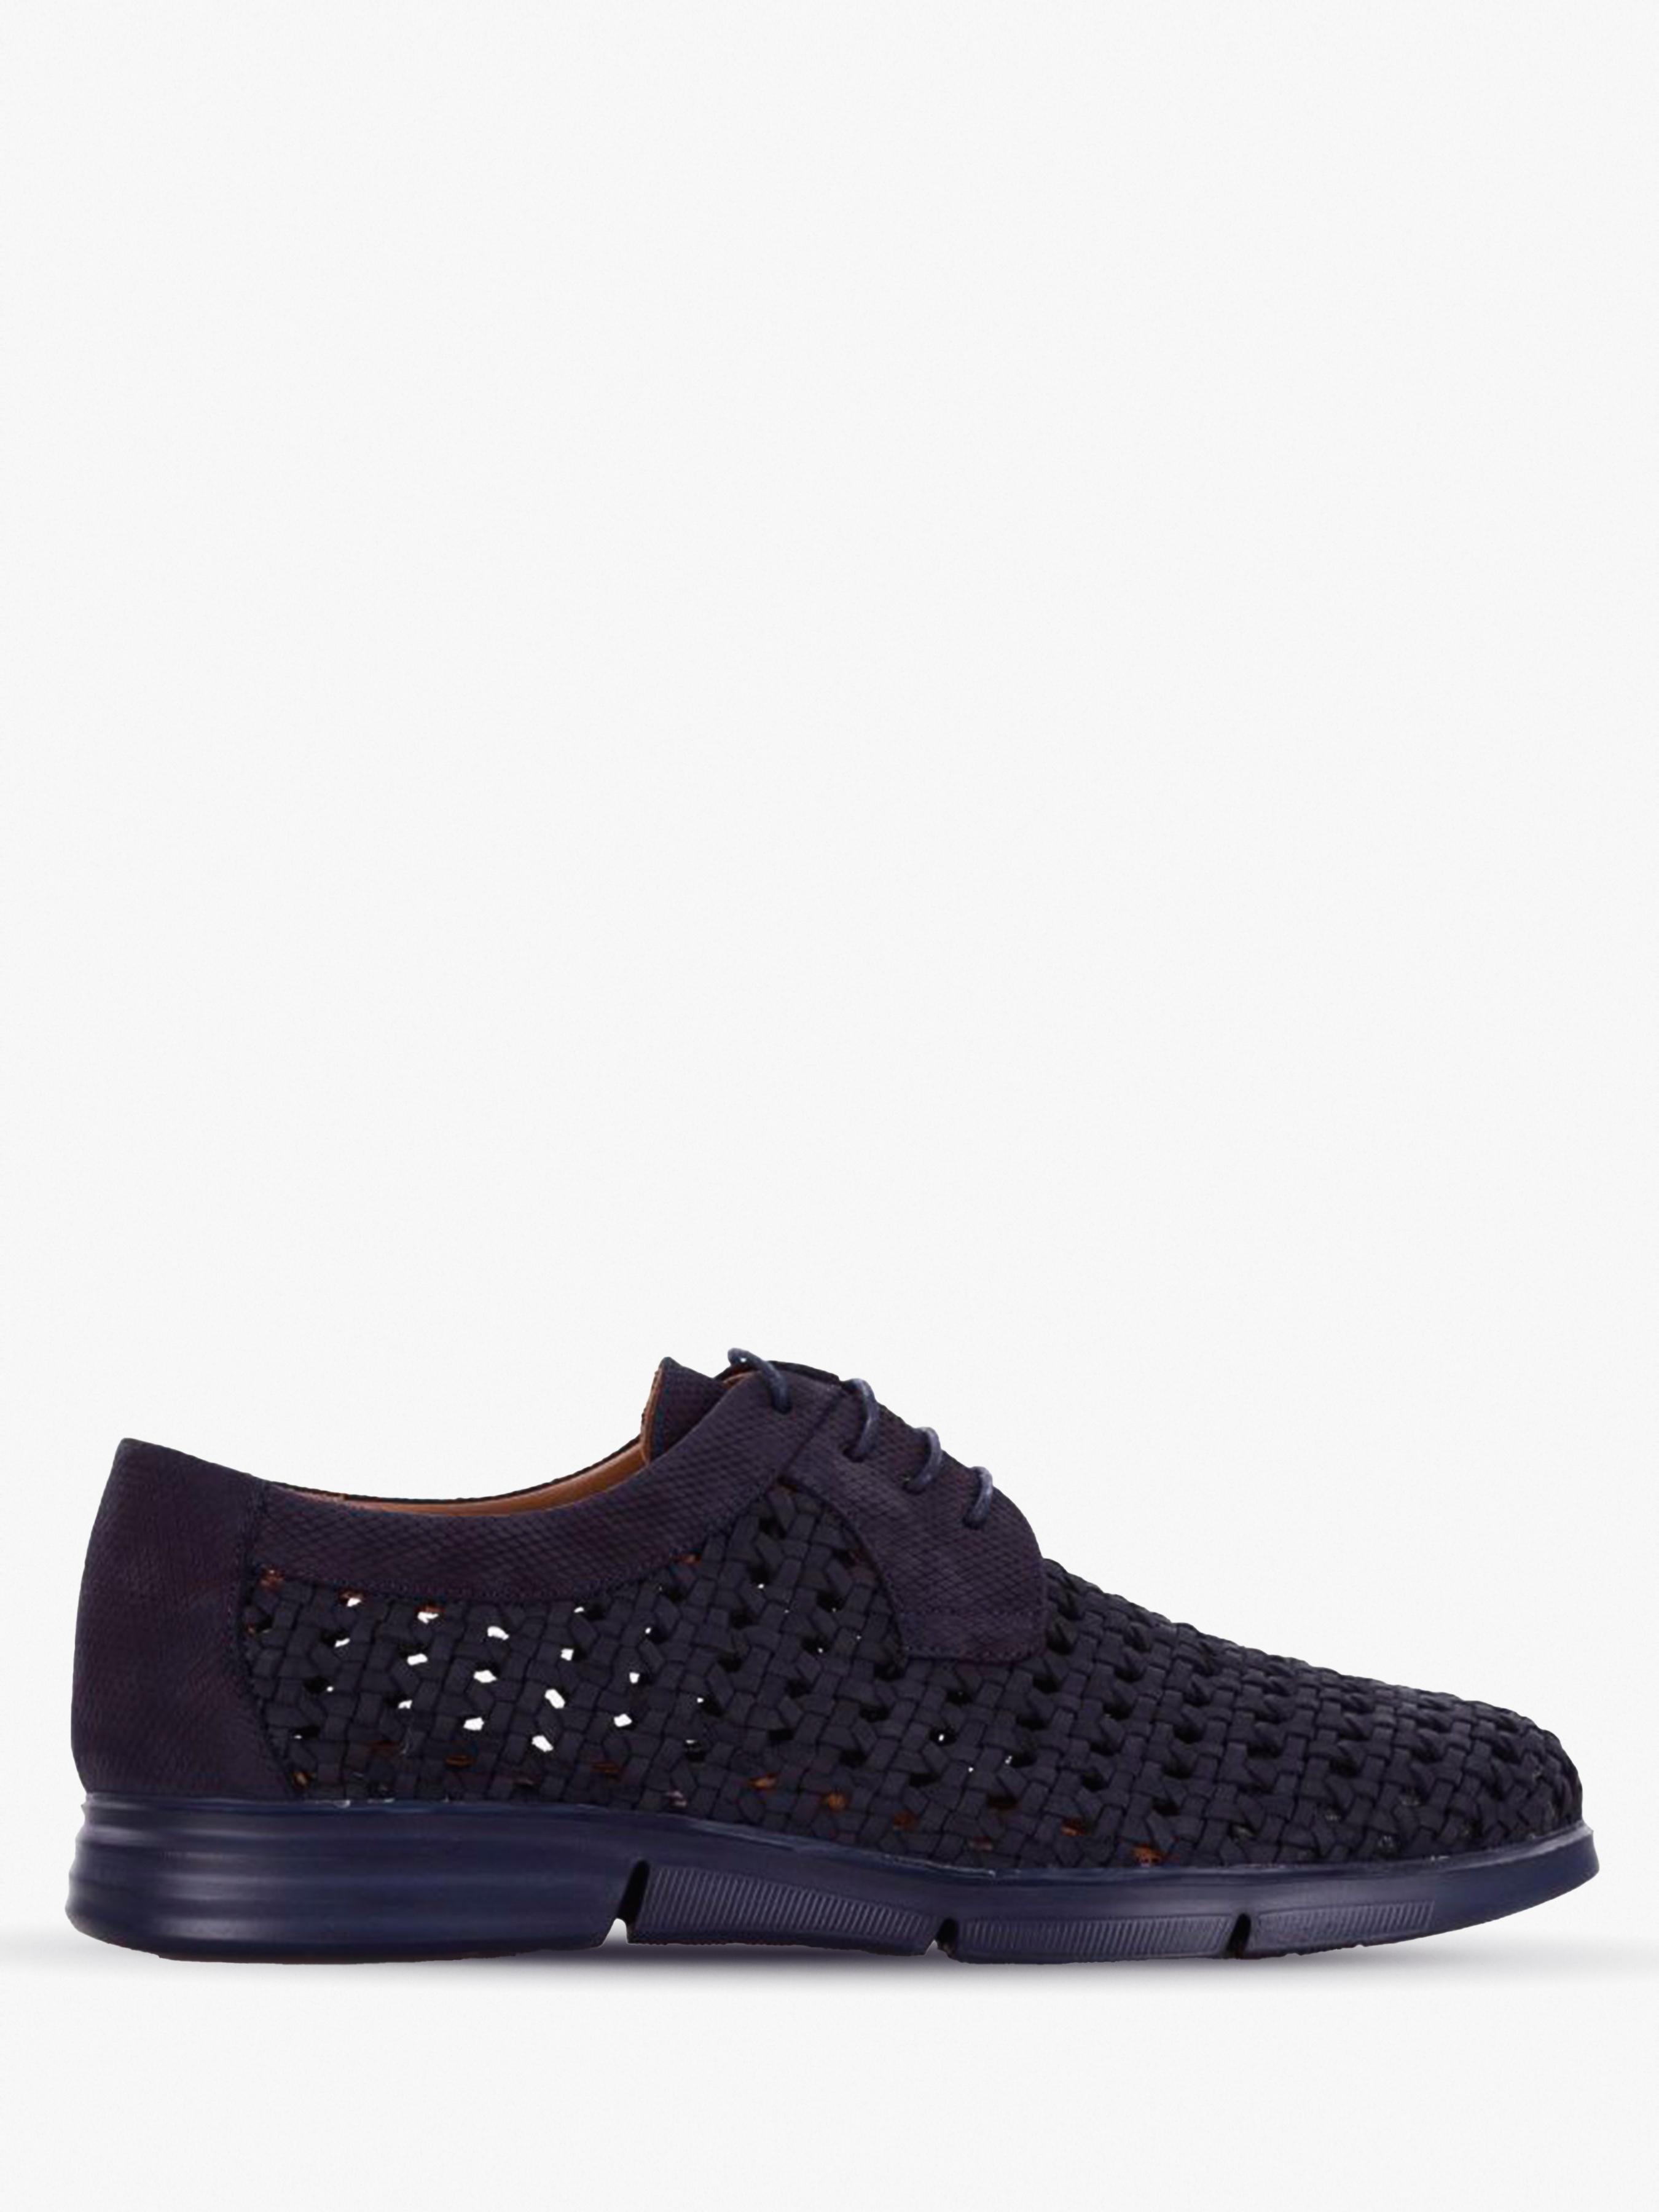 Туфли мужские MOLYER 8P14 размеры обуви, 2017